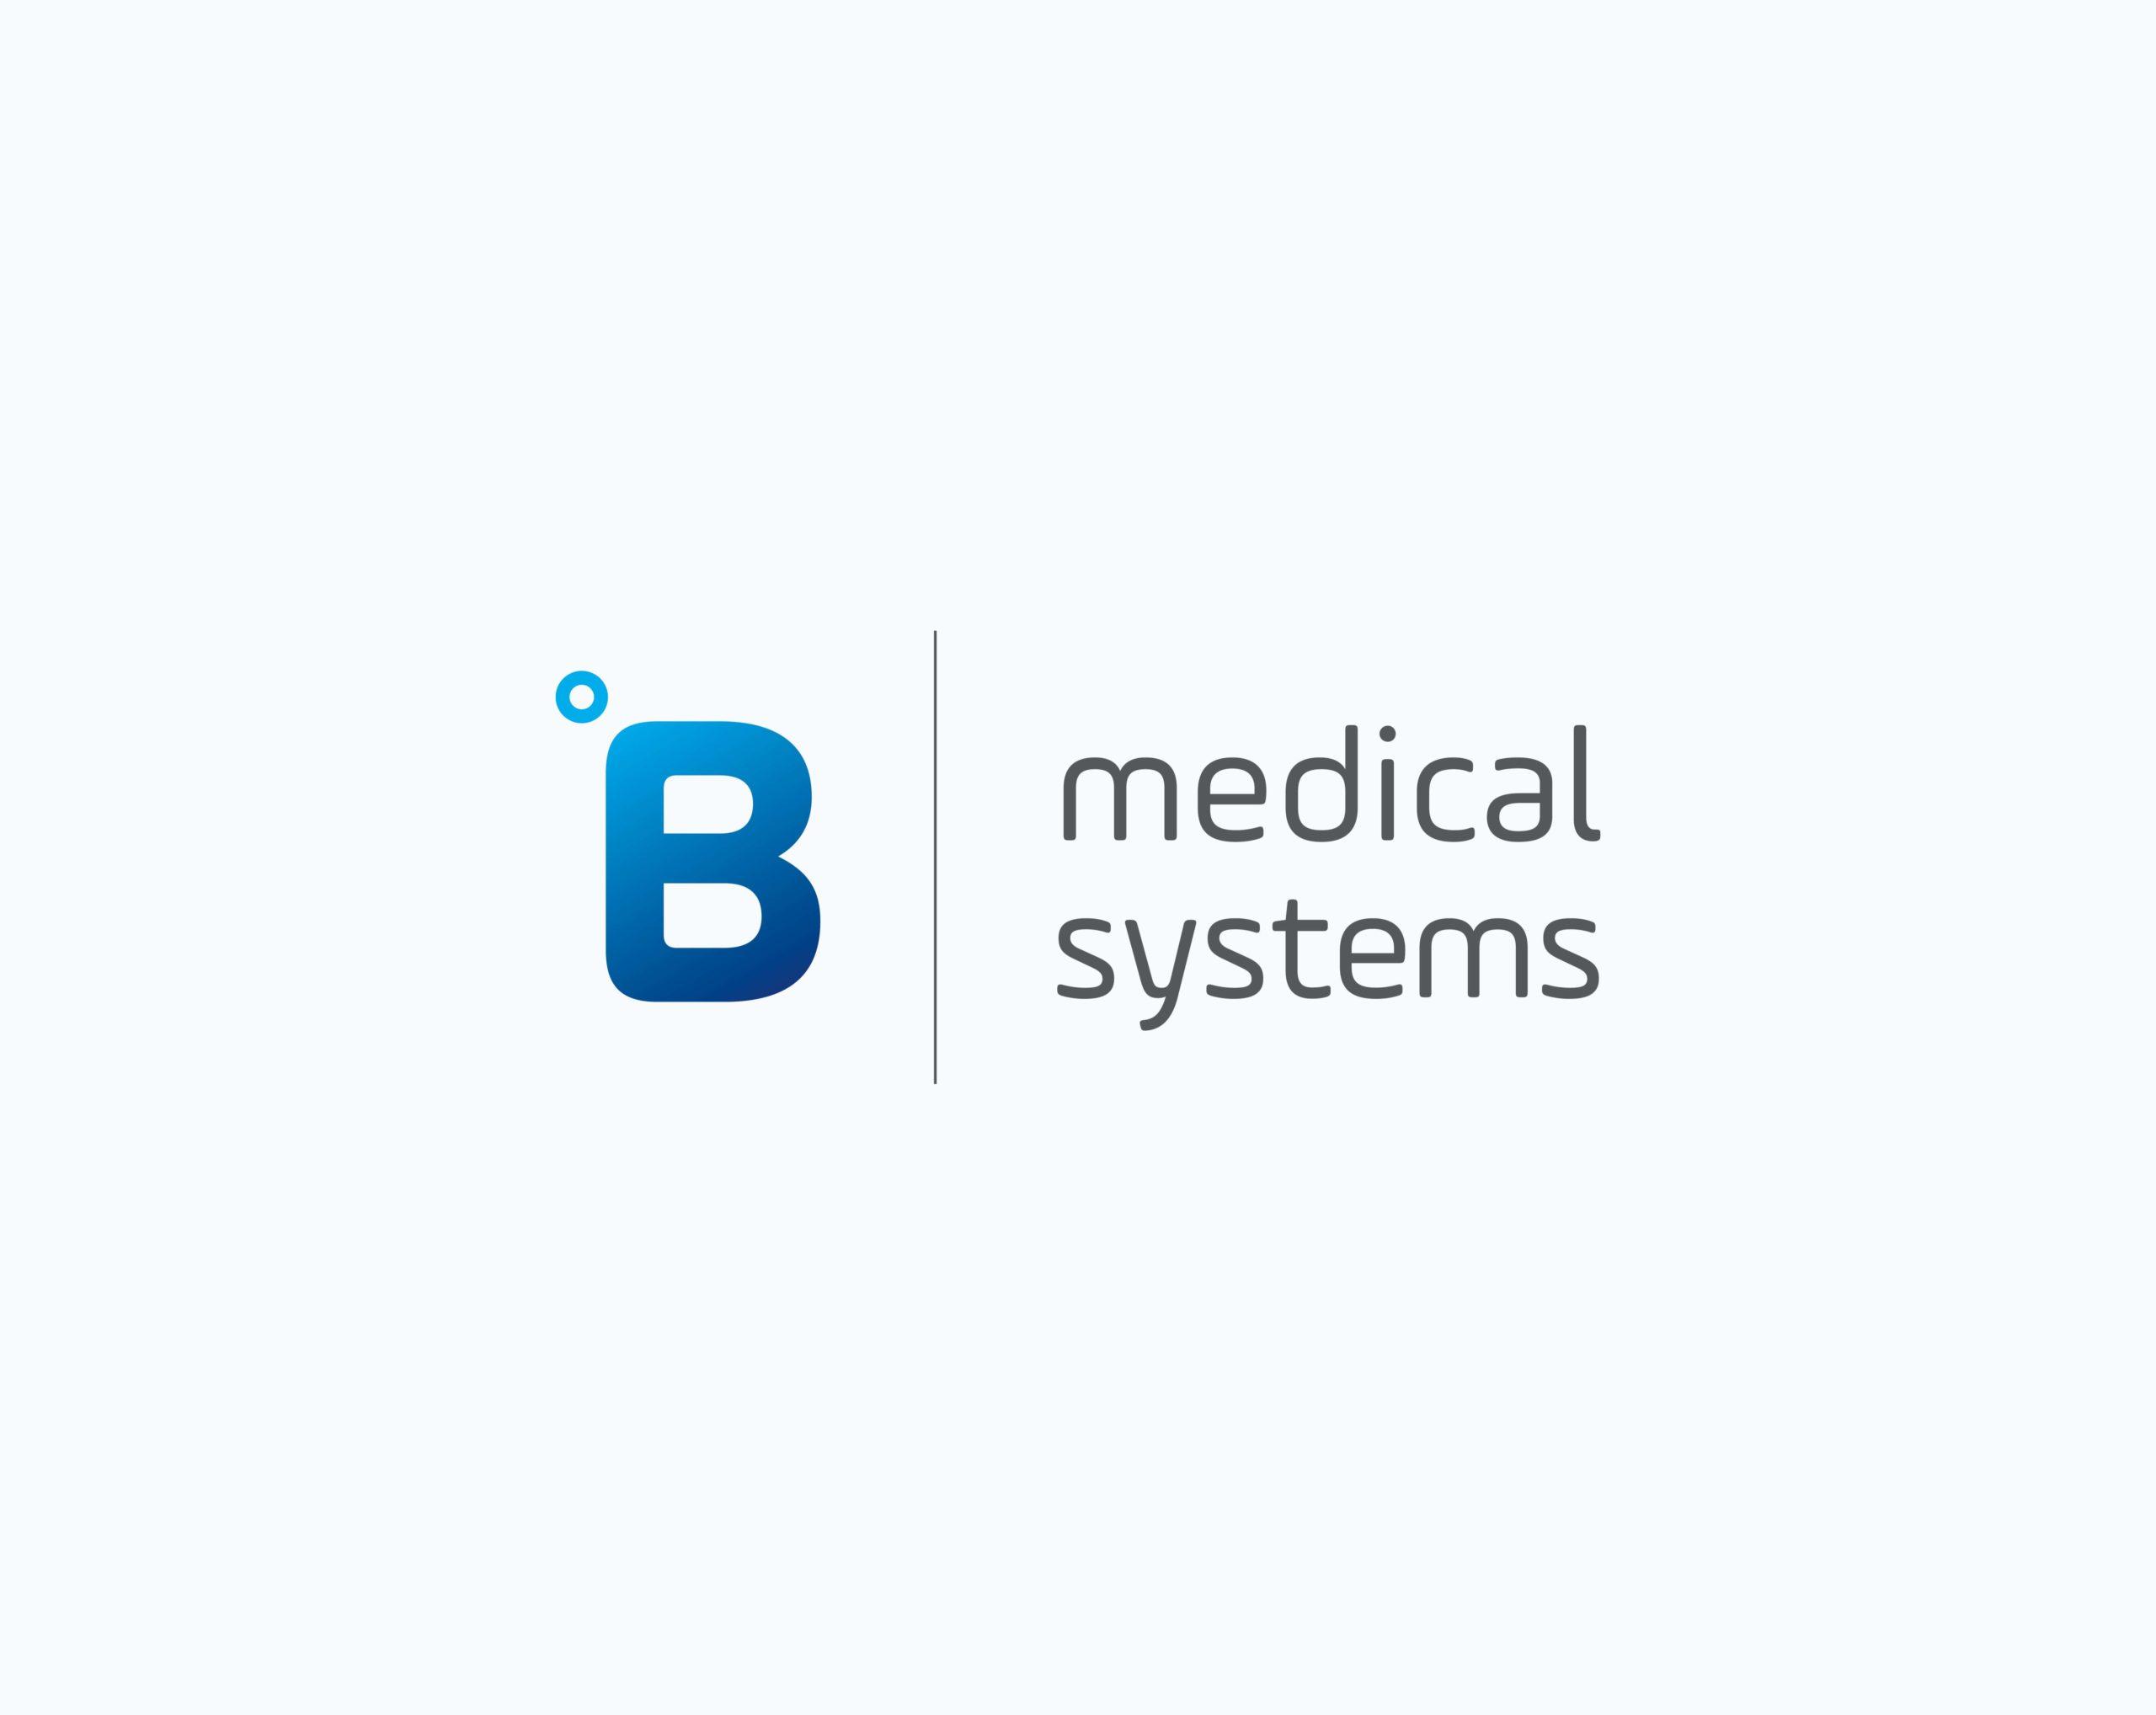 B Medical Systems - Identité visuelle